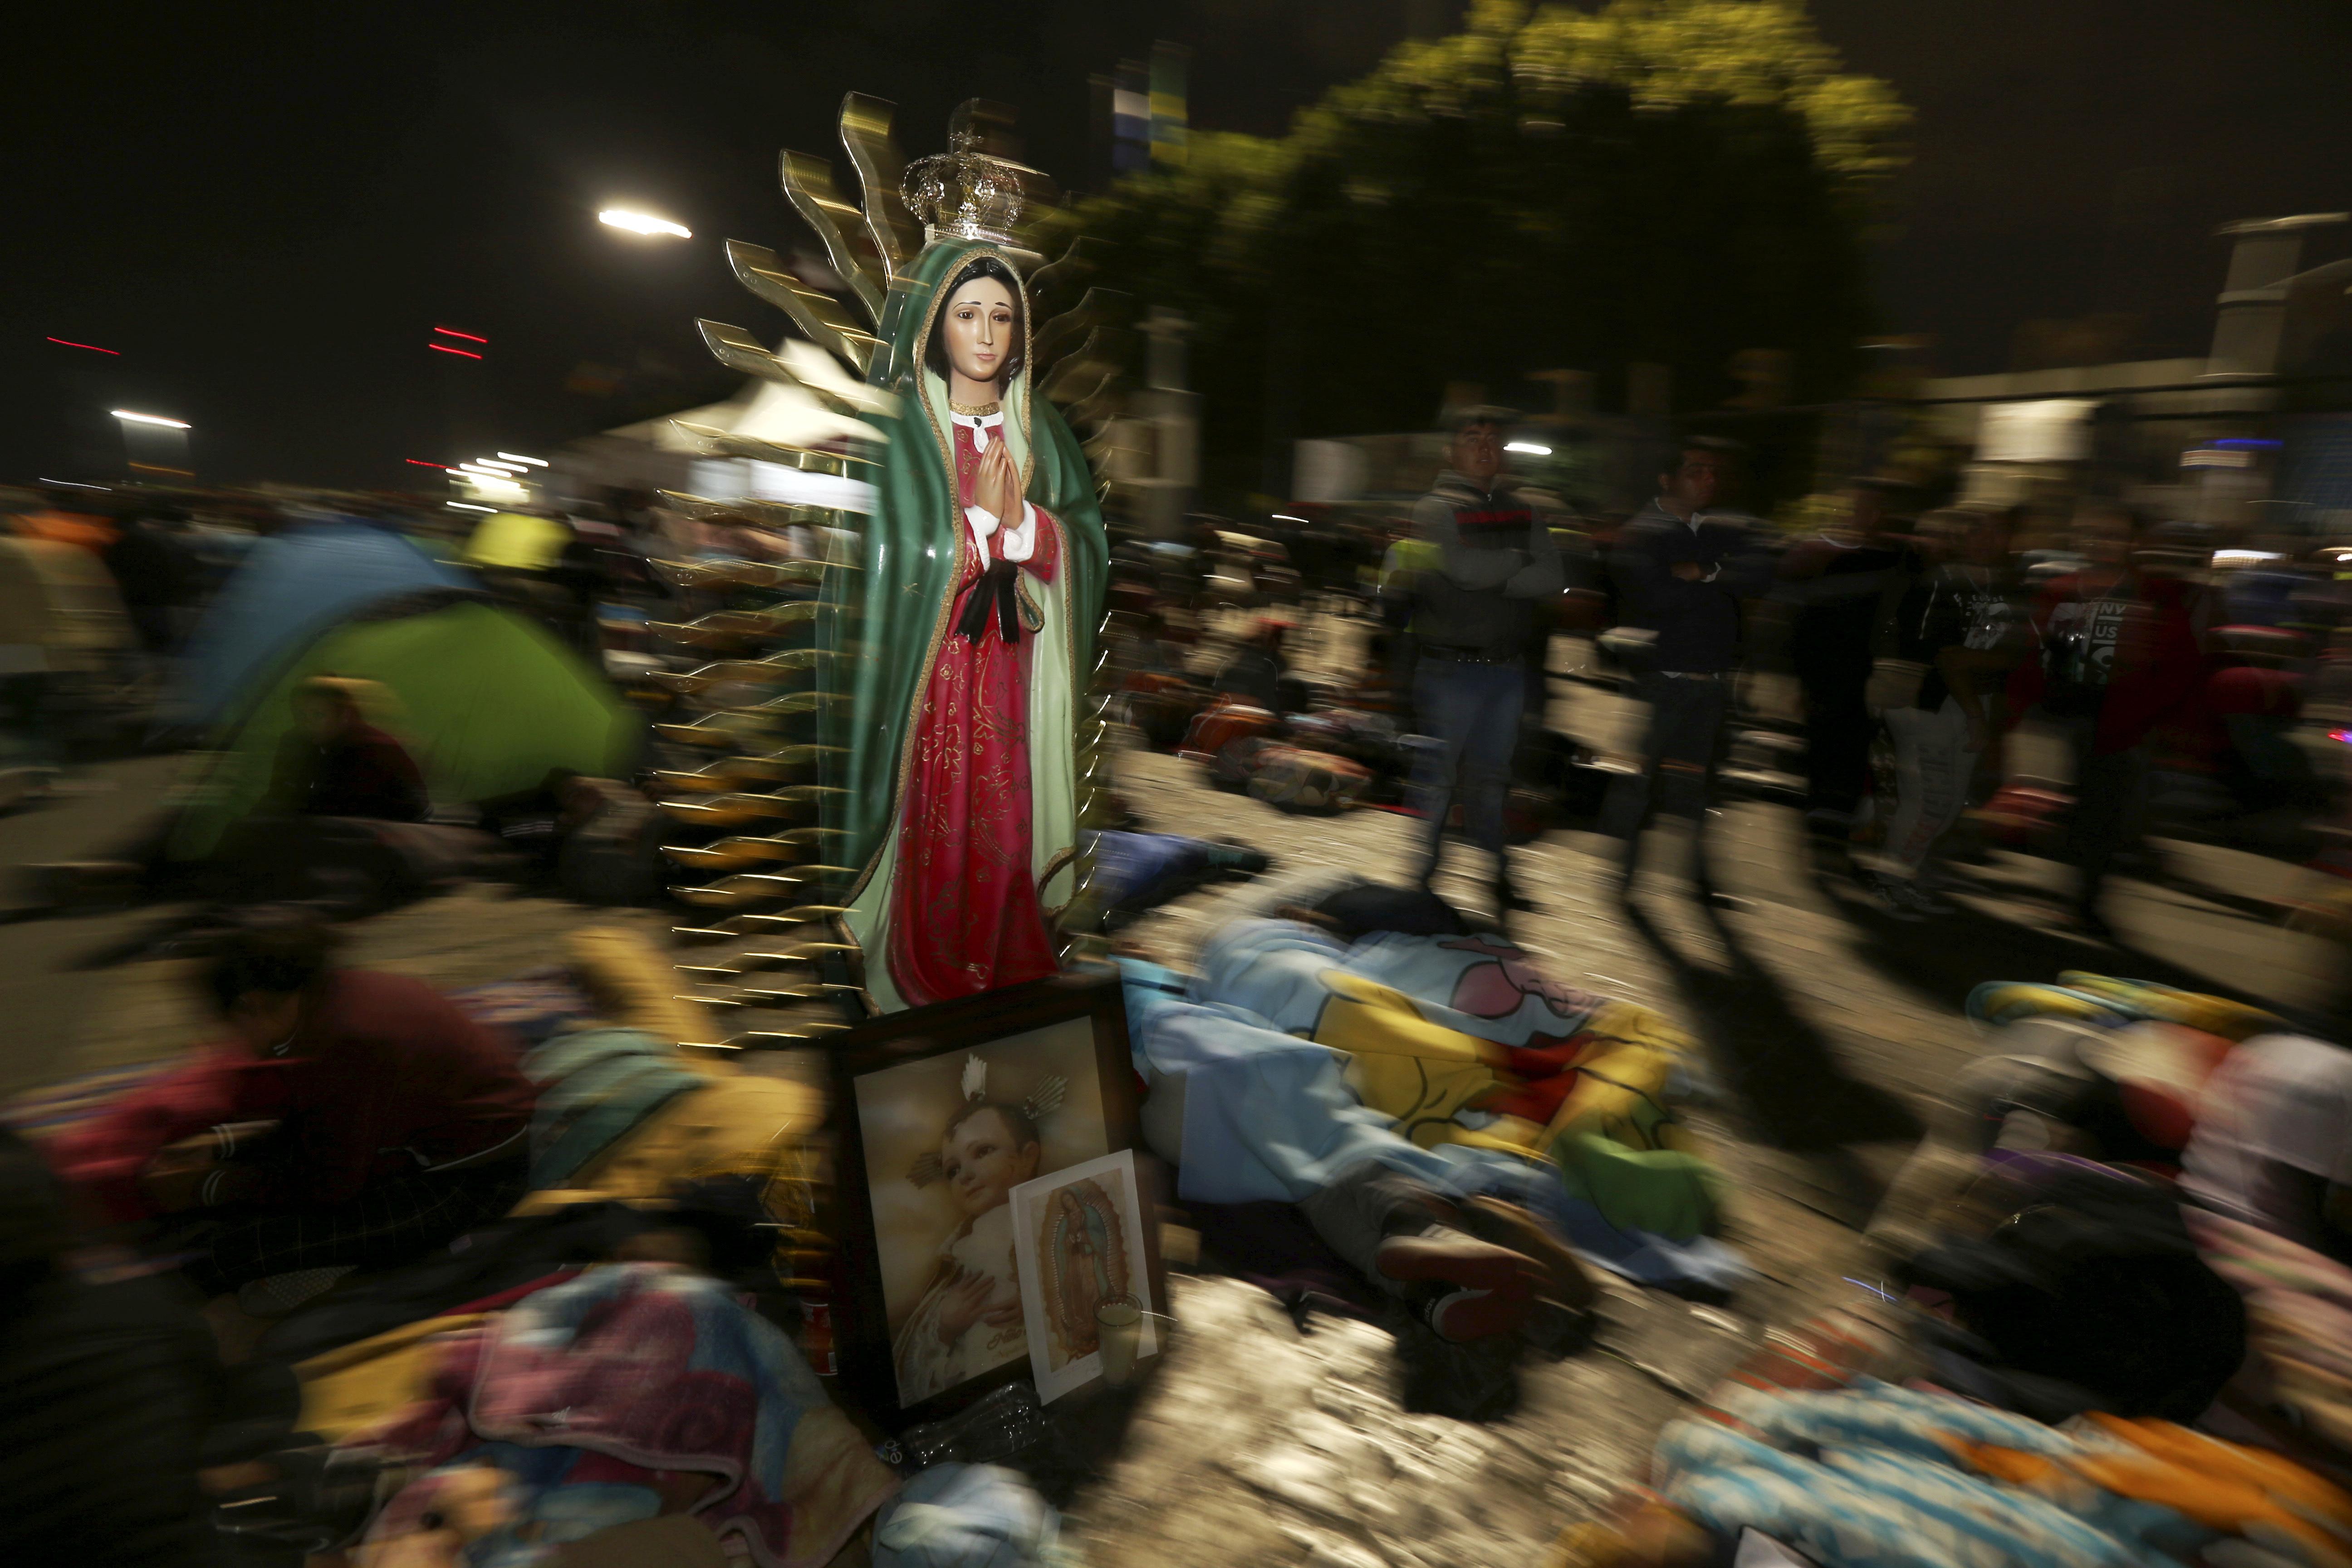 (Foto: AP Photo/Marco Ugarte)